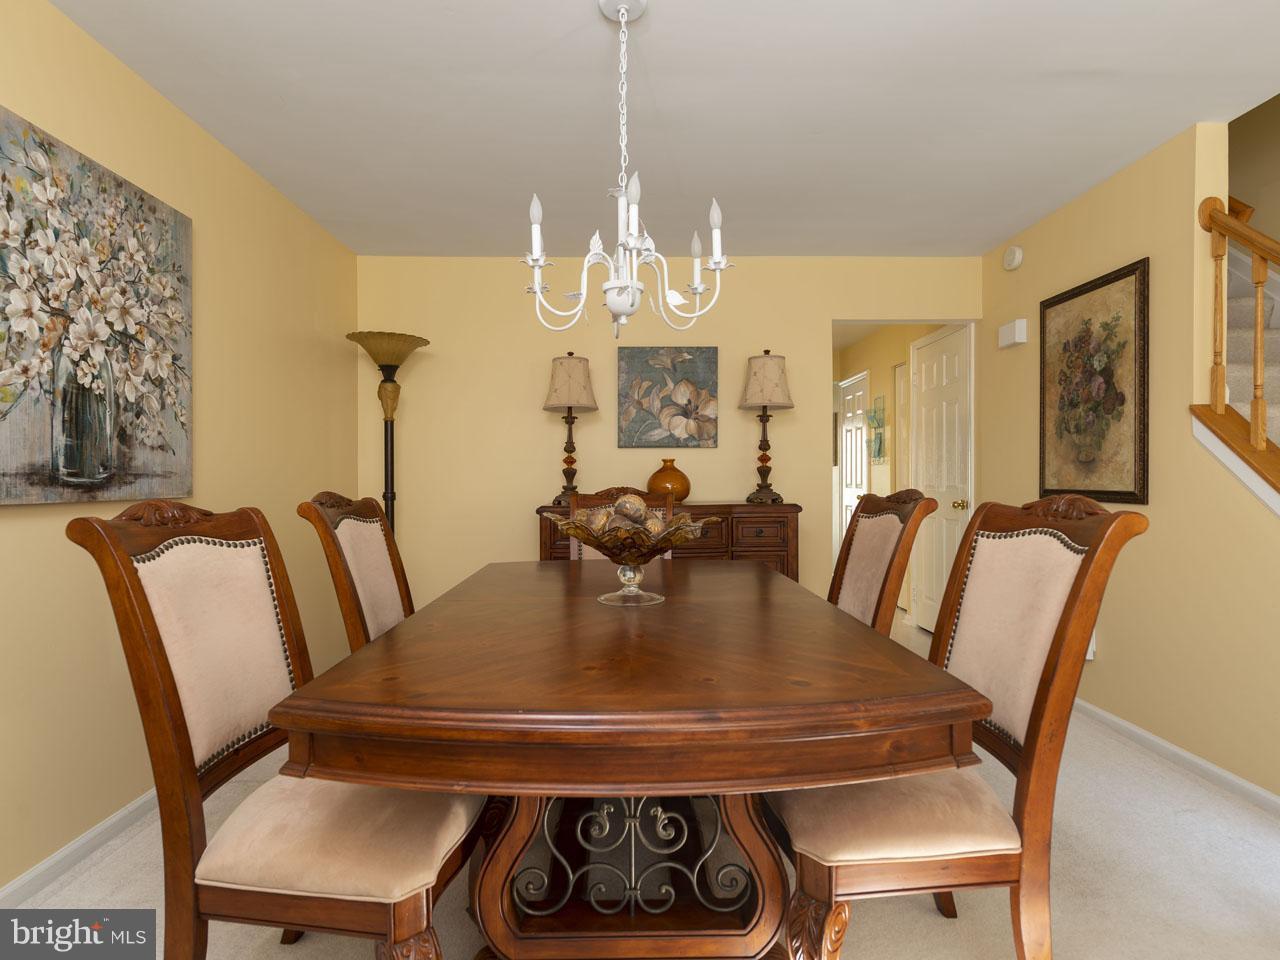 1002640508-300537944179-2021-07-22-05-00-36     Pinecrest   Alexandria Delaware Real Estate For Sale   MLS# 1002640508  - Best of Northern Virginia